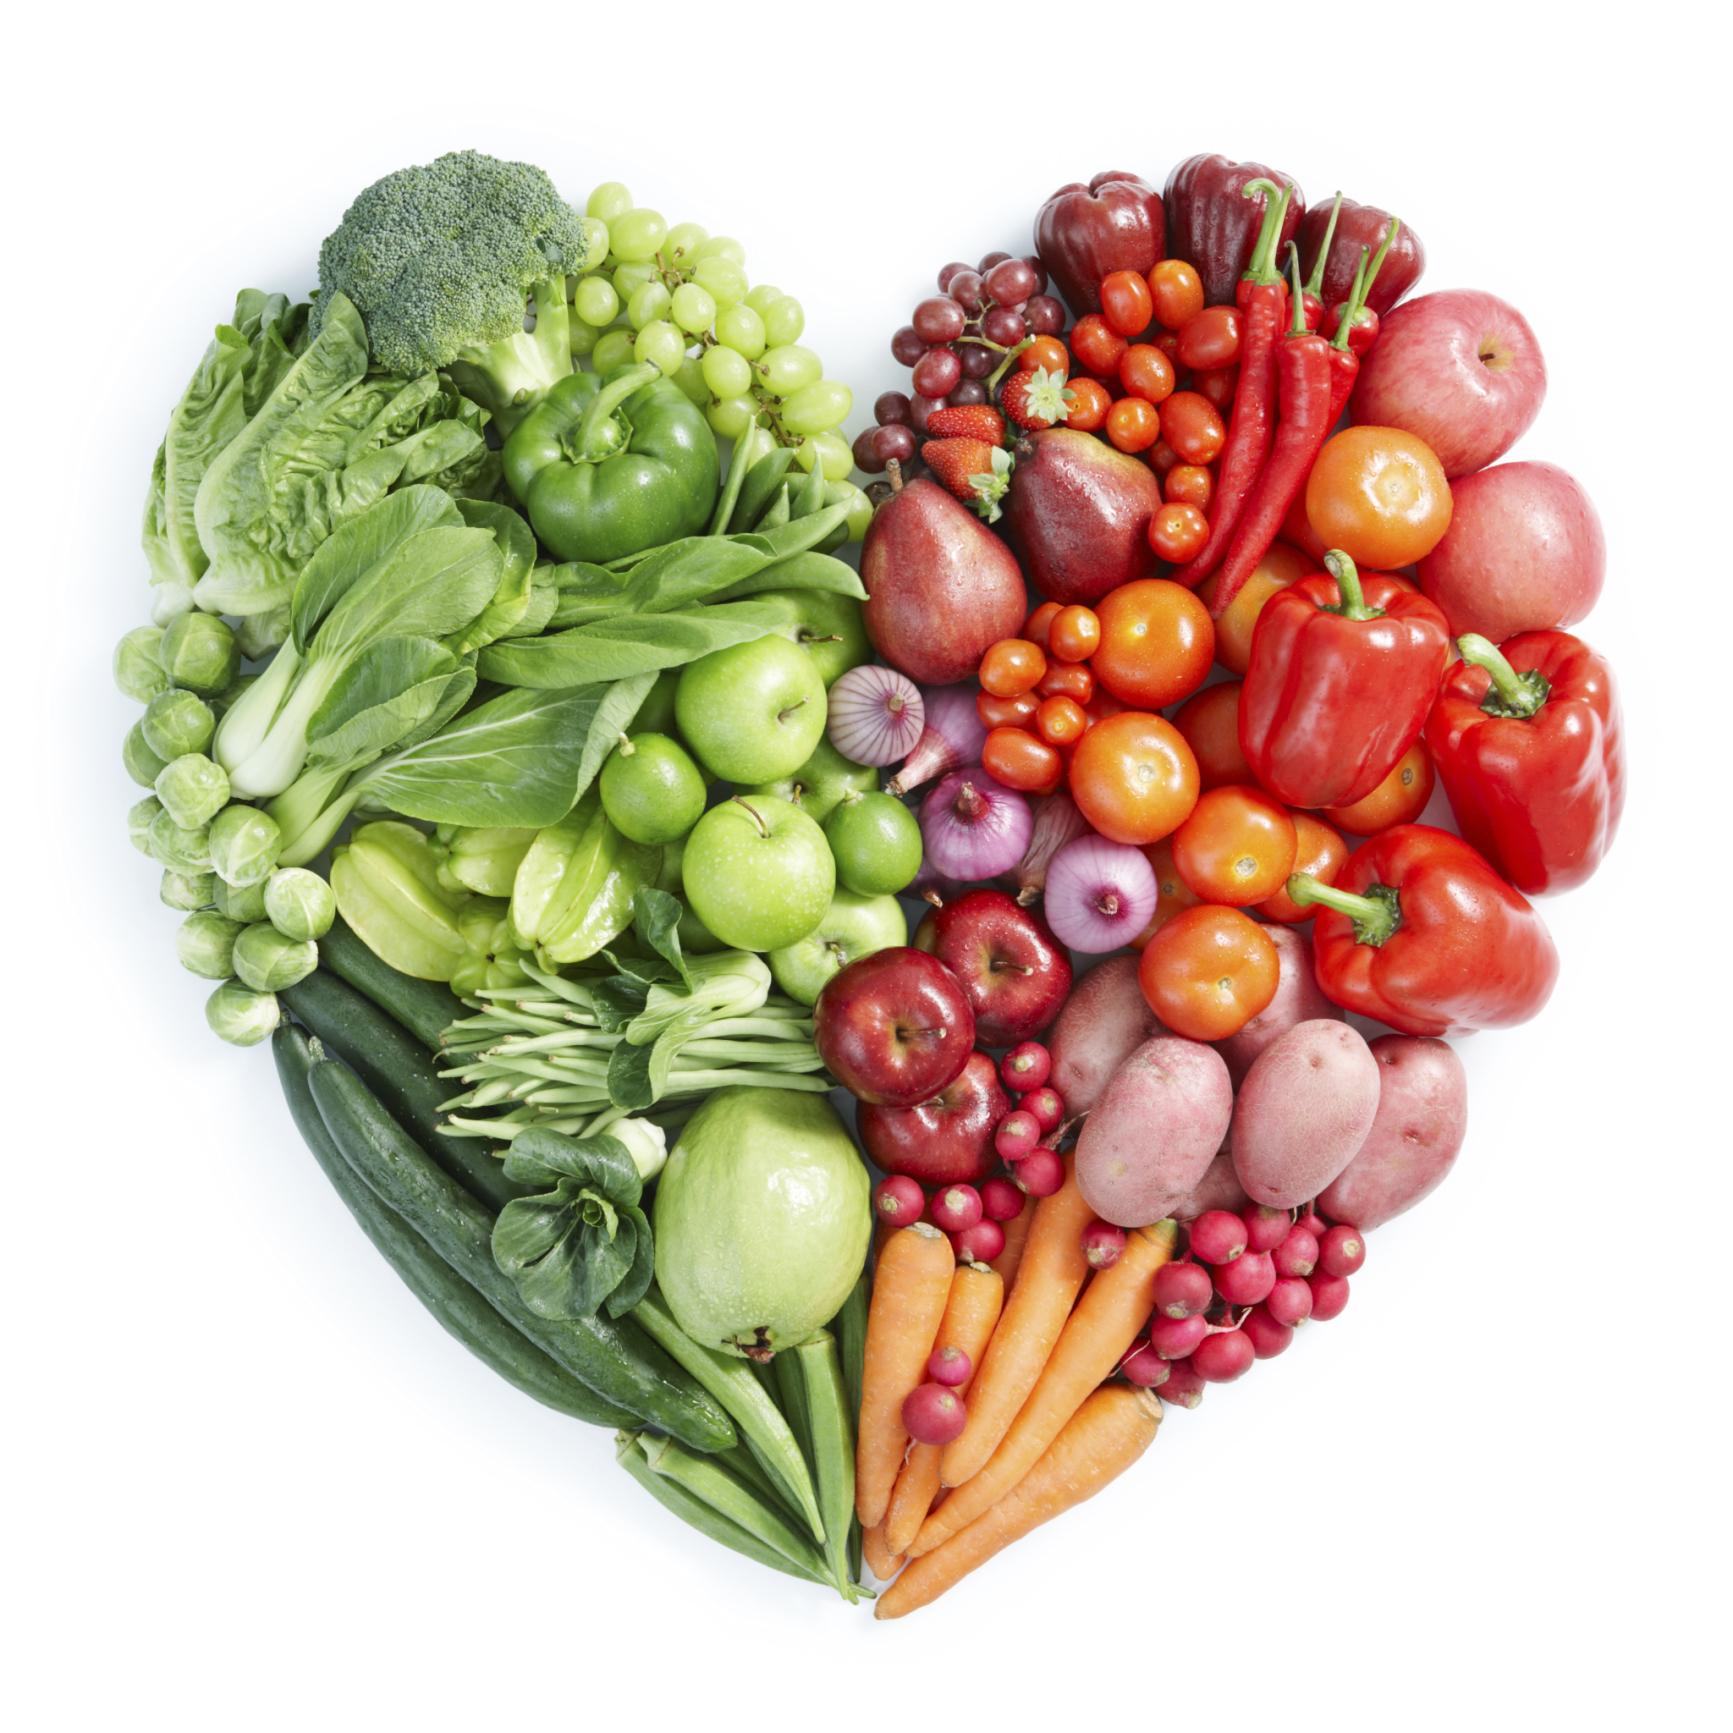 Alimentacion para bajar de peso con hipotiroidismo in english